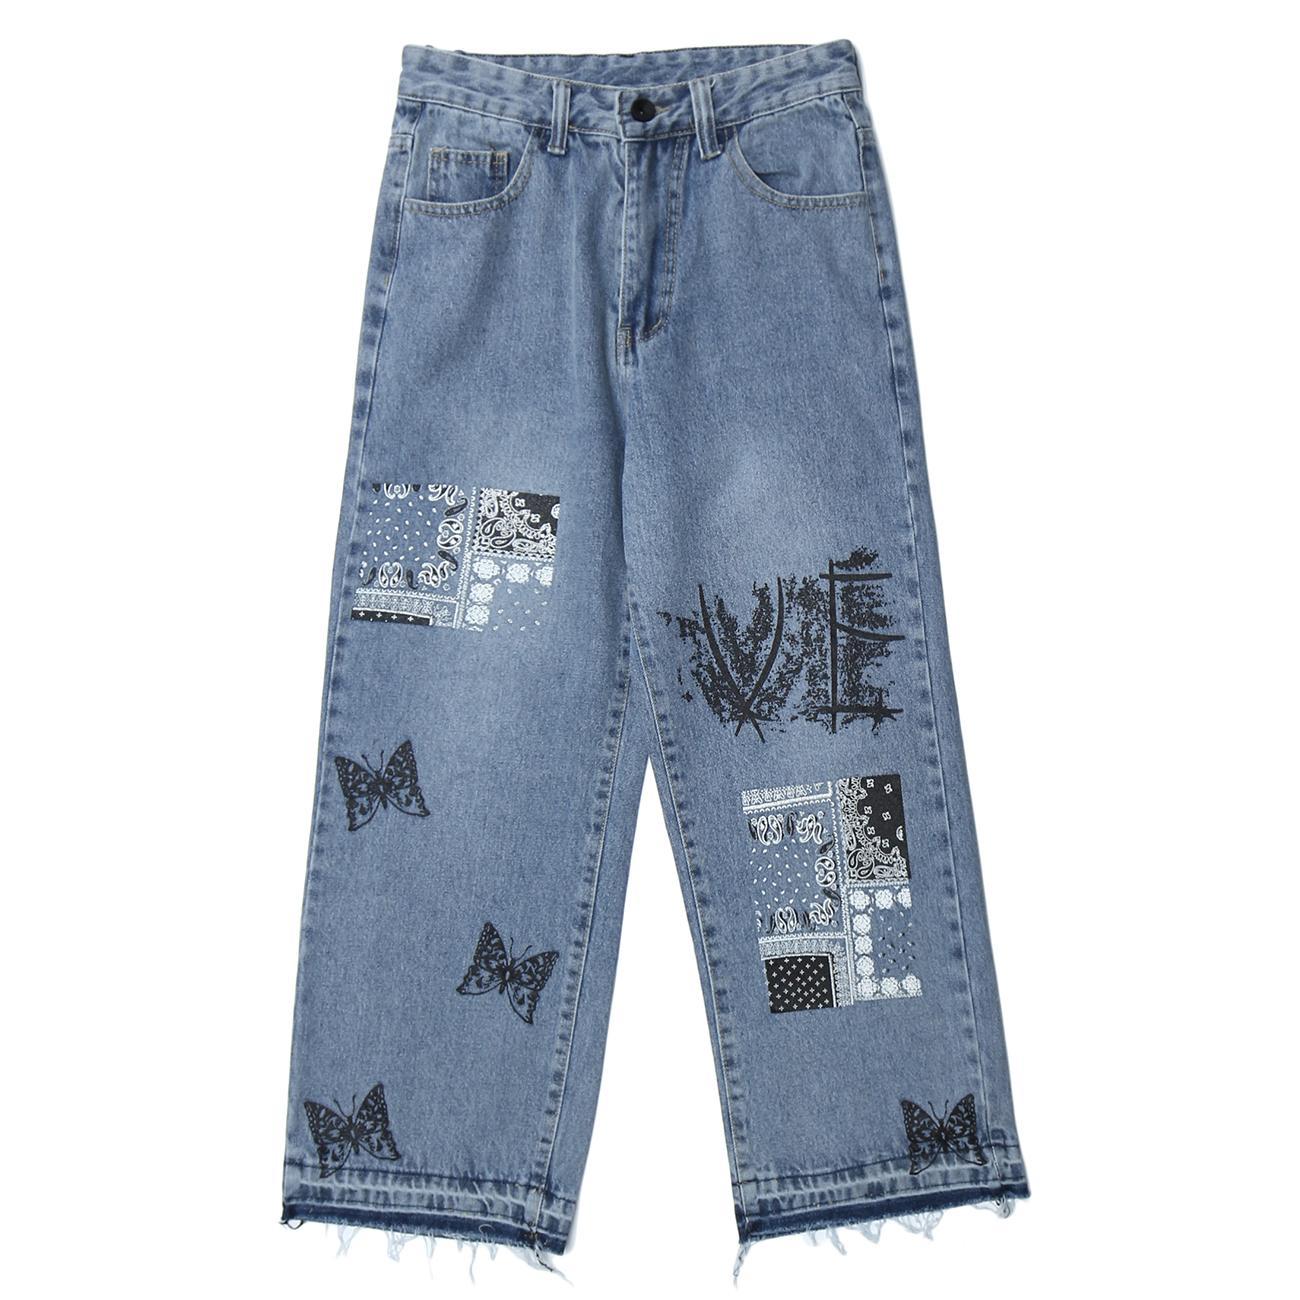 Vintage Denim Patchwork Butterfly Stampa Streetwear Jeans Harajuku Hip Hop Pantaloni da uomo Pantaloni da uomo Jogger